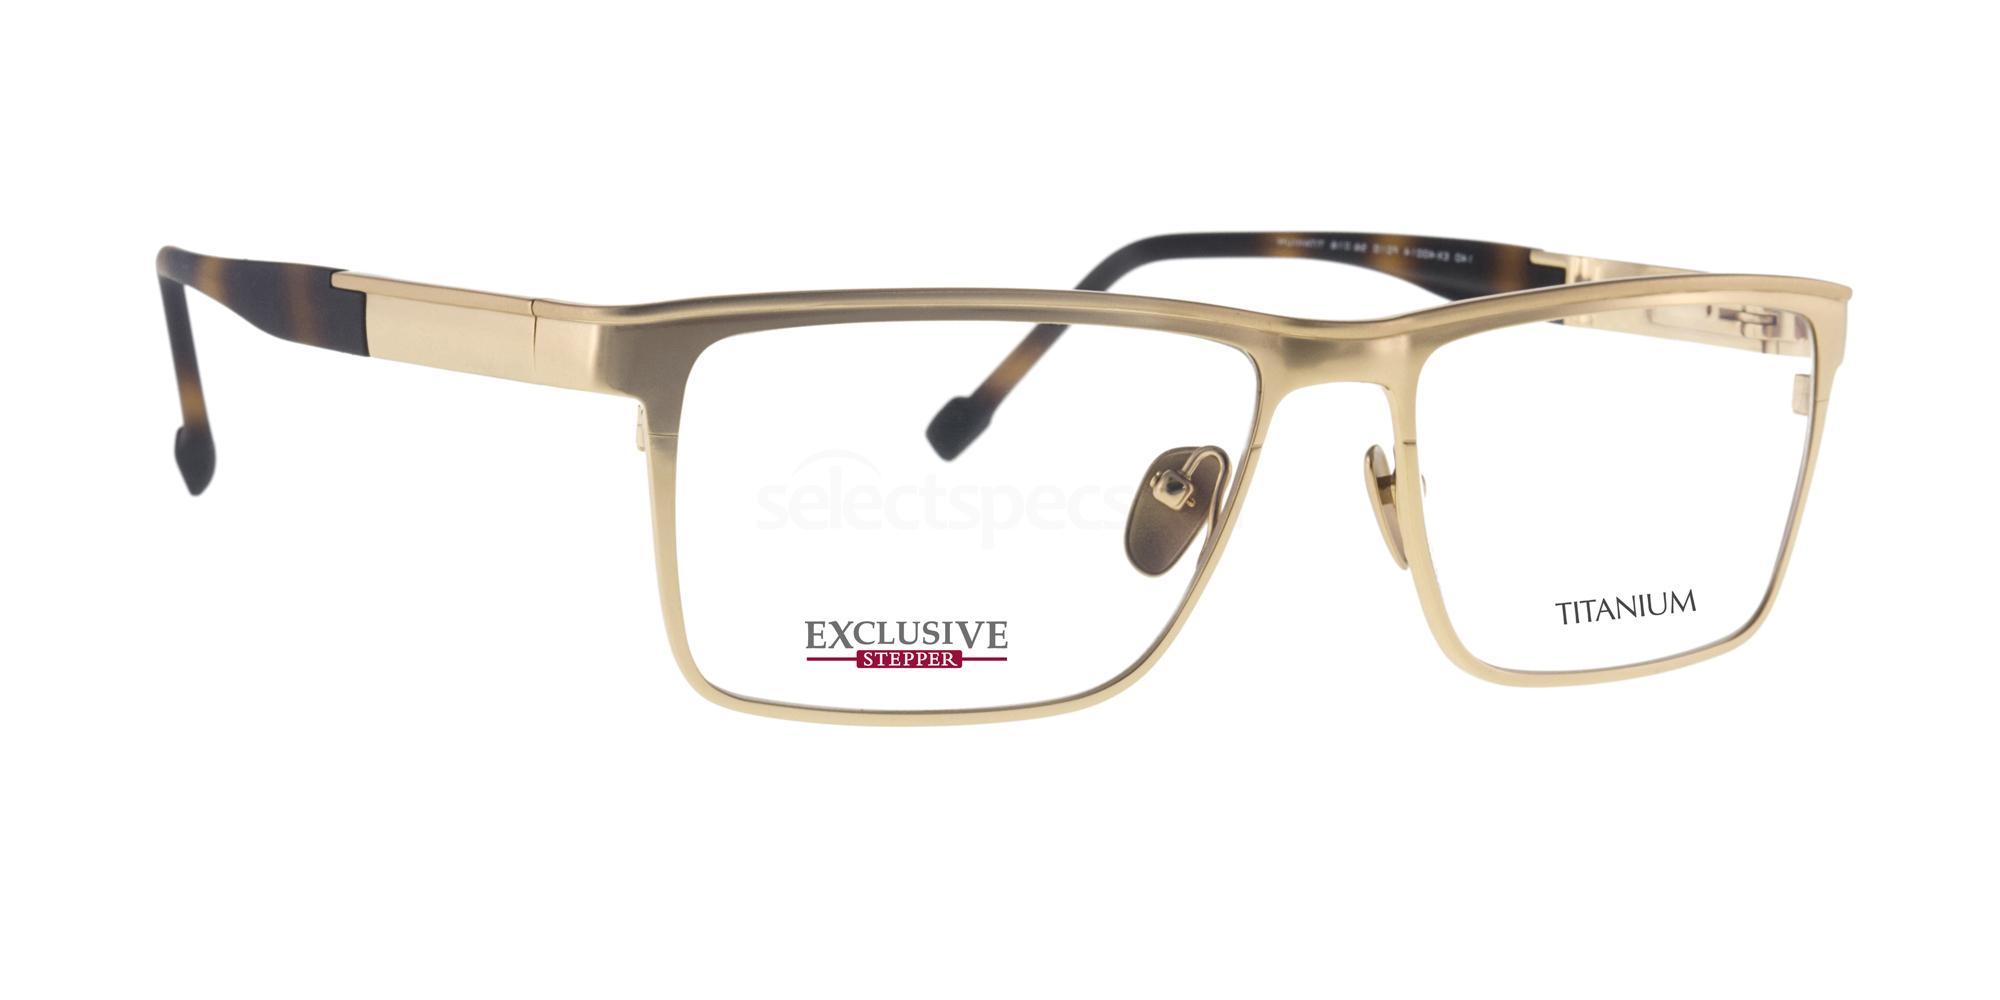 F010 EX 40014 Glasses, Stepper Exclusive